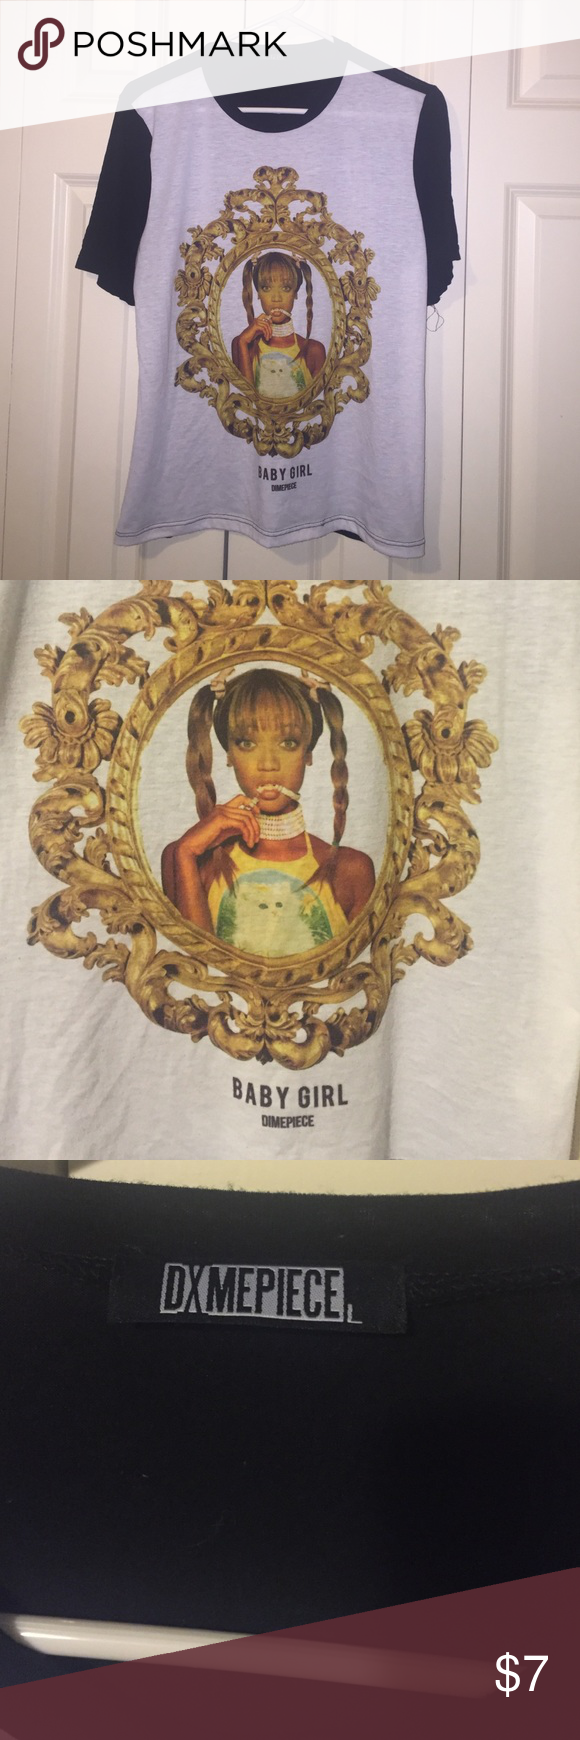 DIMEPIECE Tyra Banks Baby Girl Tee DIMEPEICE Tyra Banks Baby Girl Tee Tops Tees - Short Sleeve